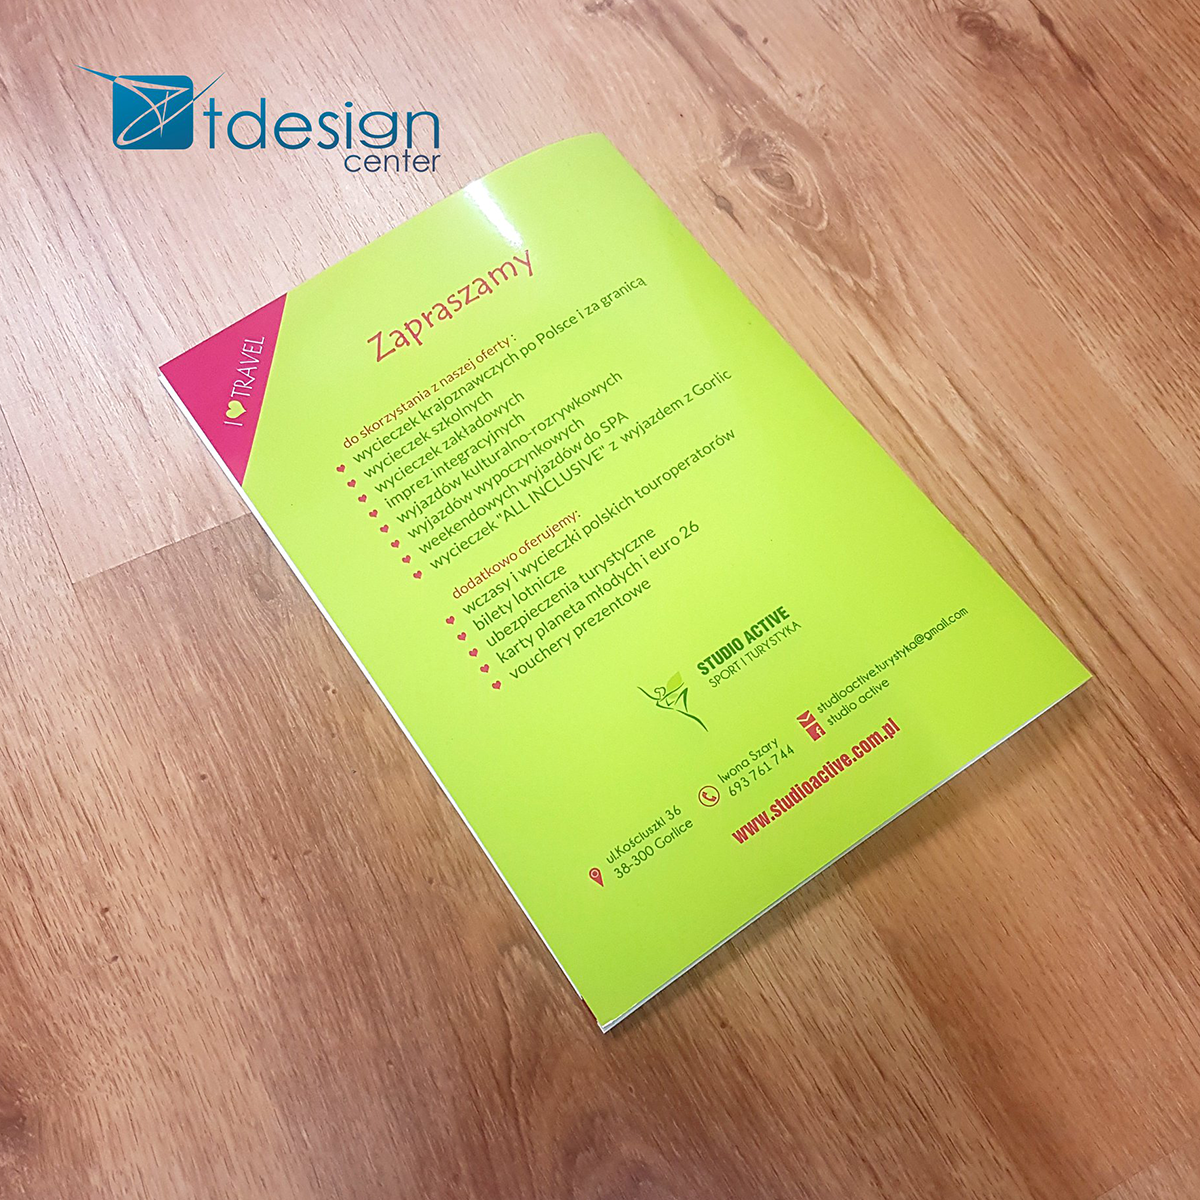 Katalog biura podróży Studio Active - projekt + druk